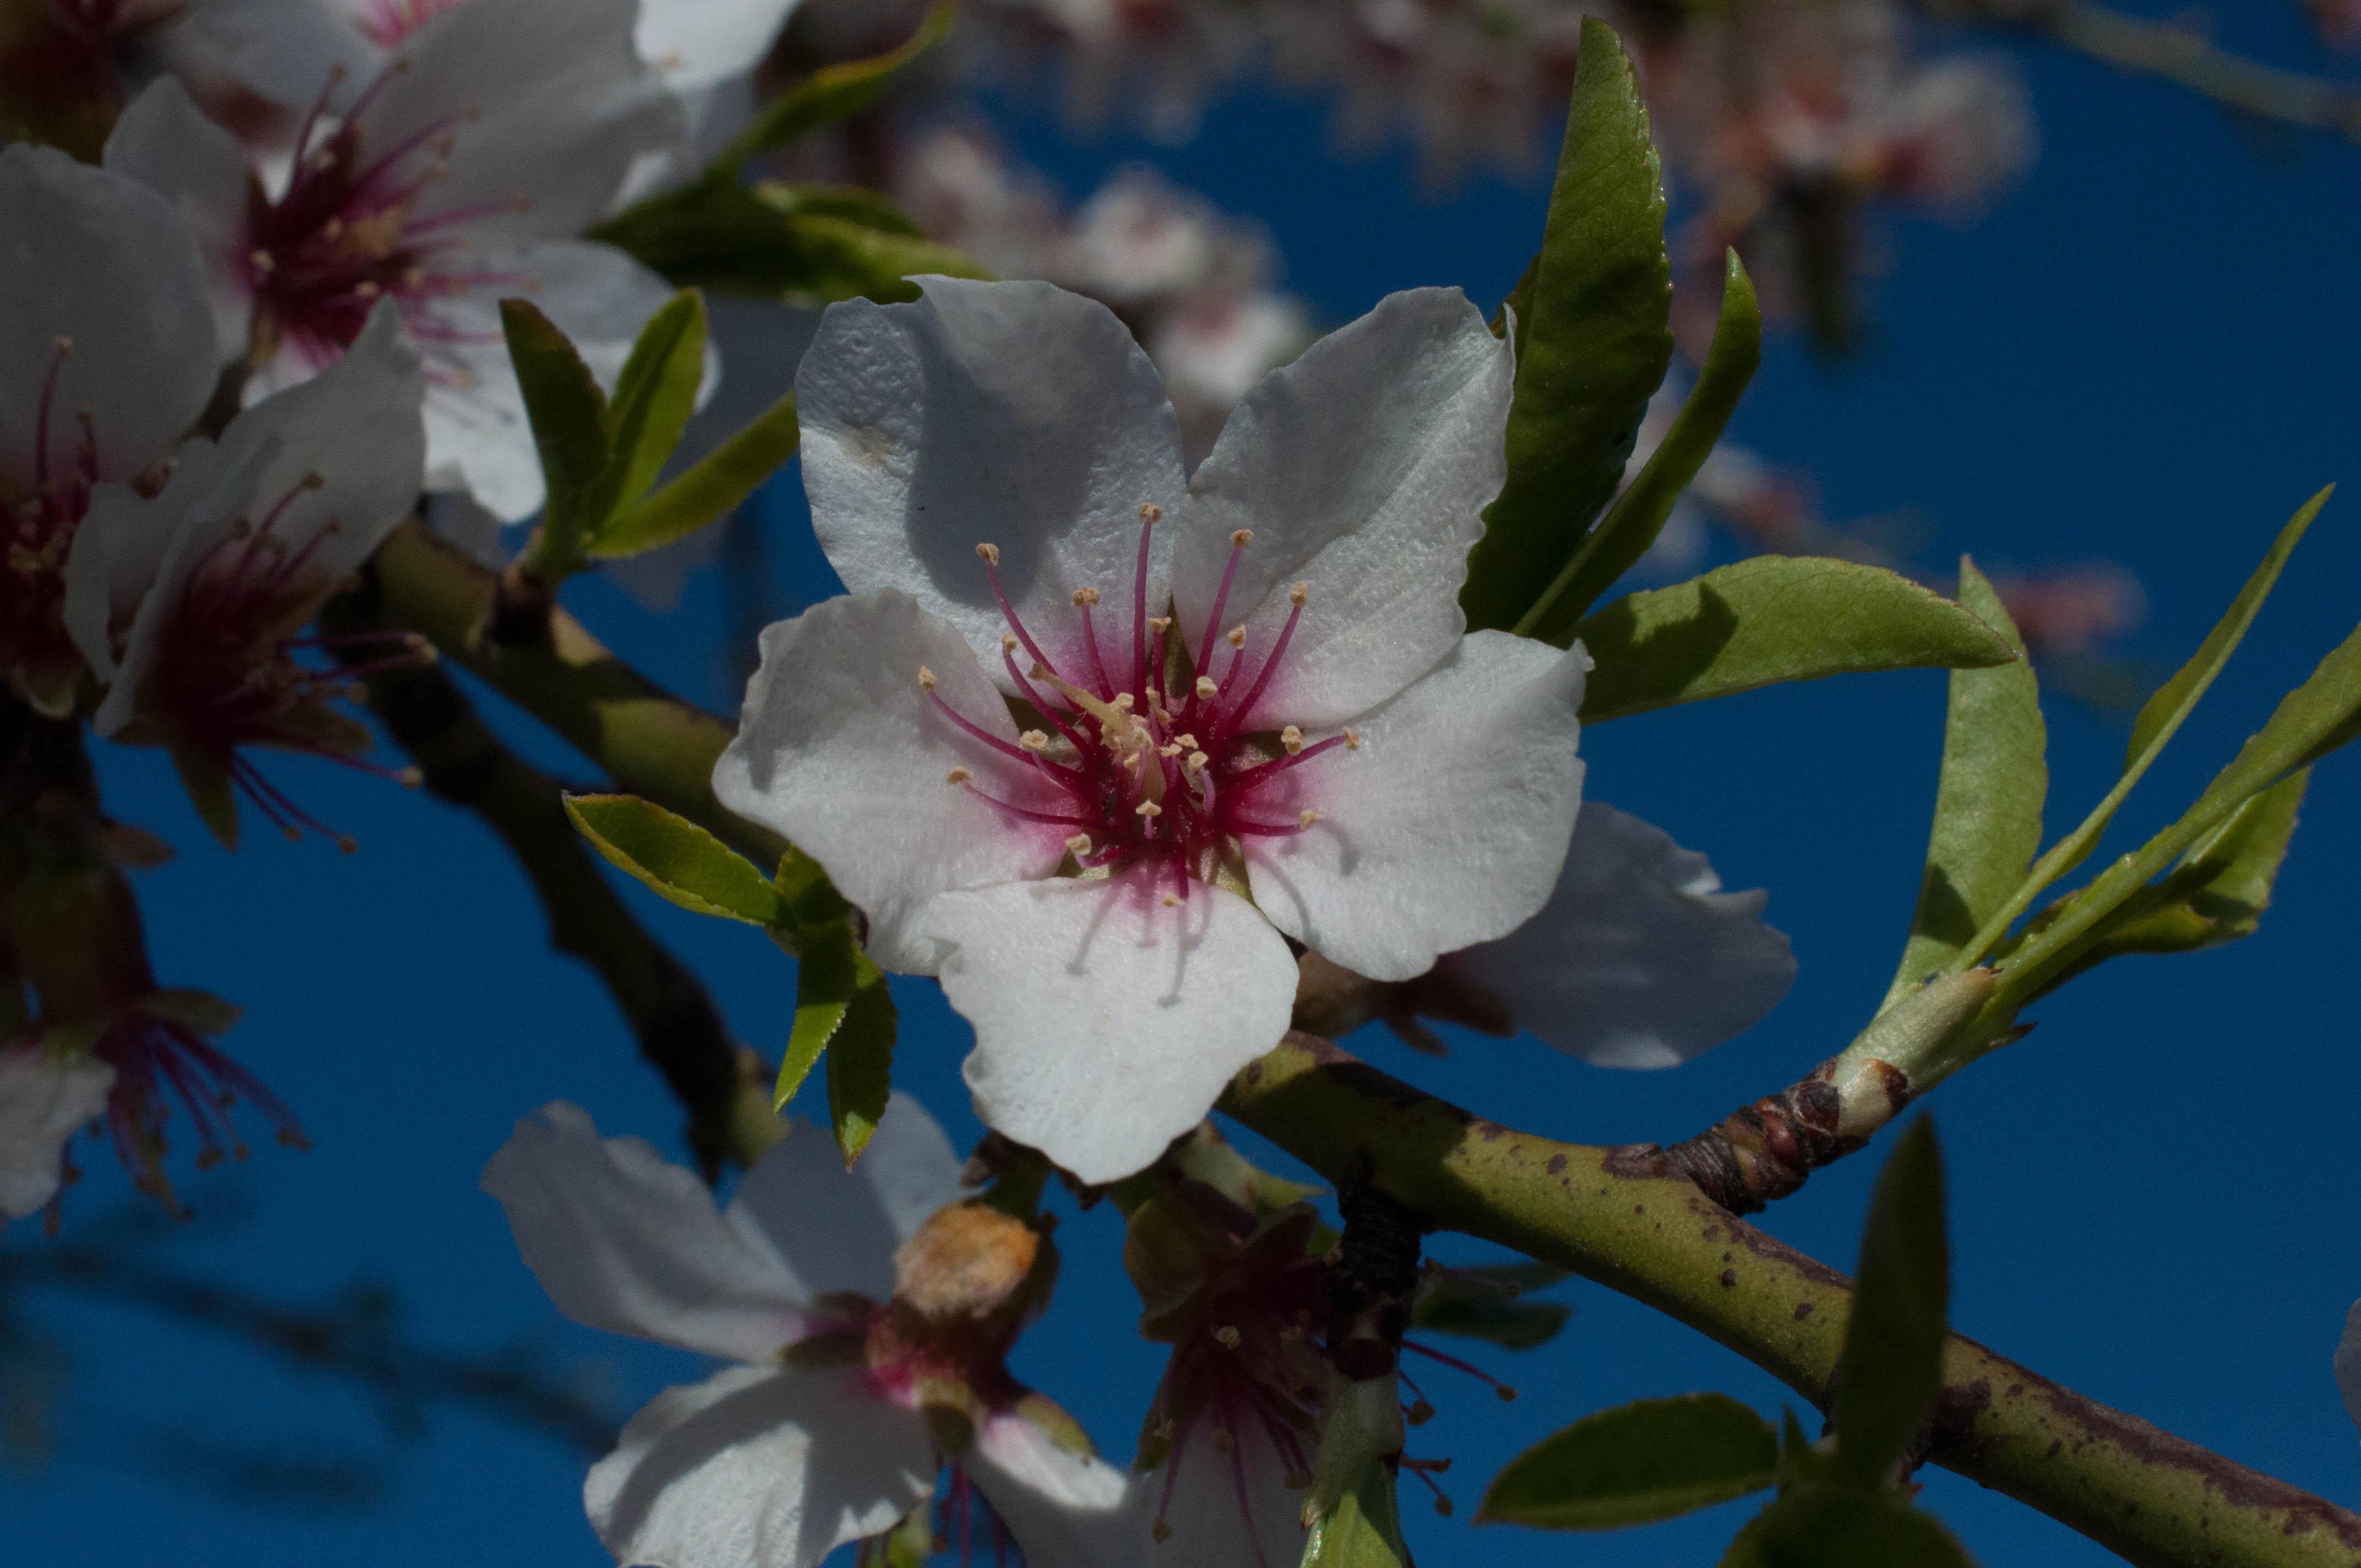 Prunus dulcis almendro Las Obreras de Aliste